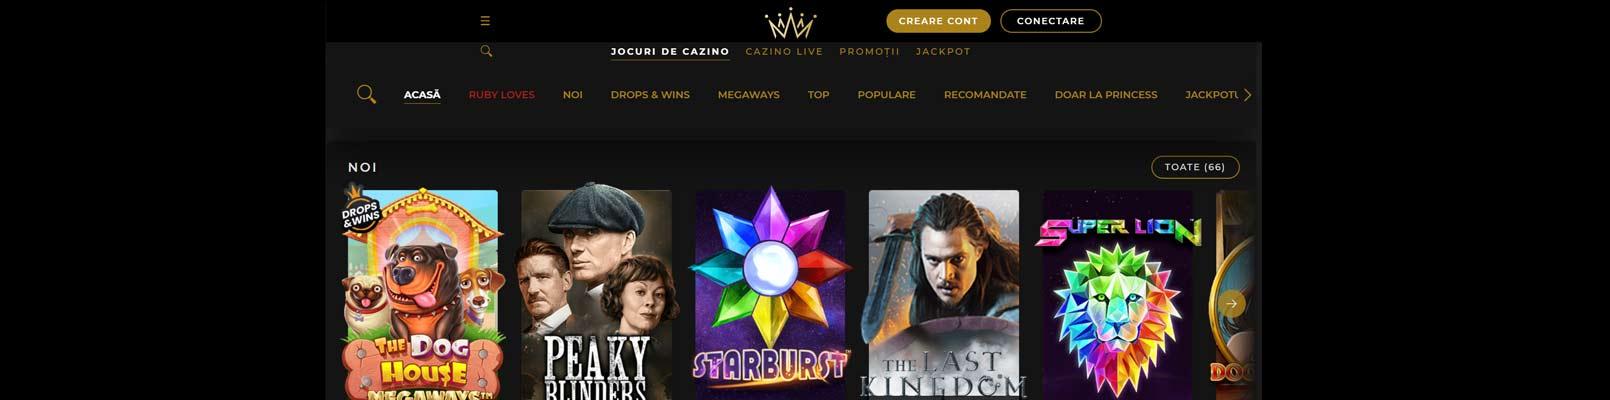 interfata site princess casino